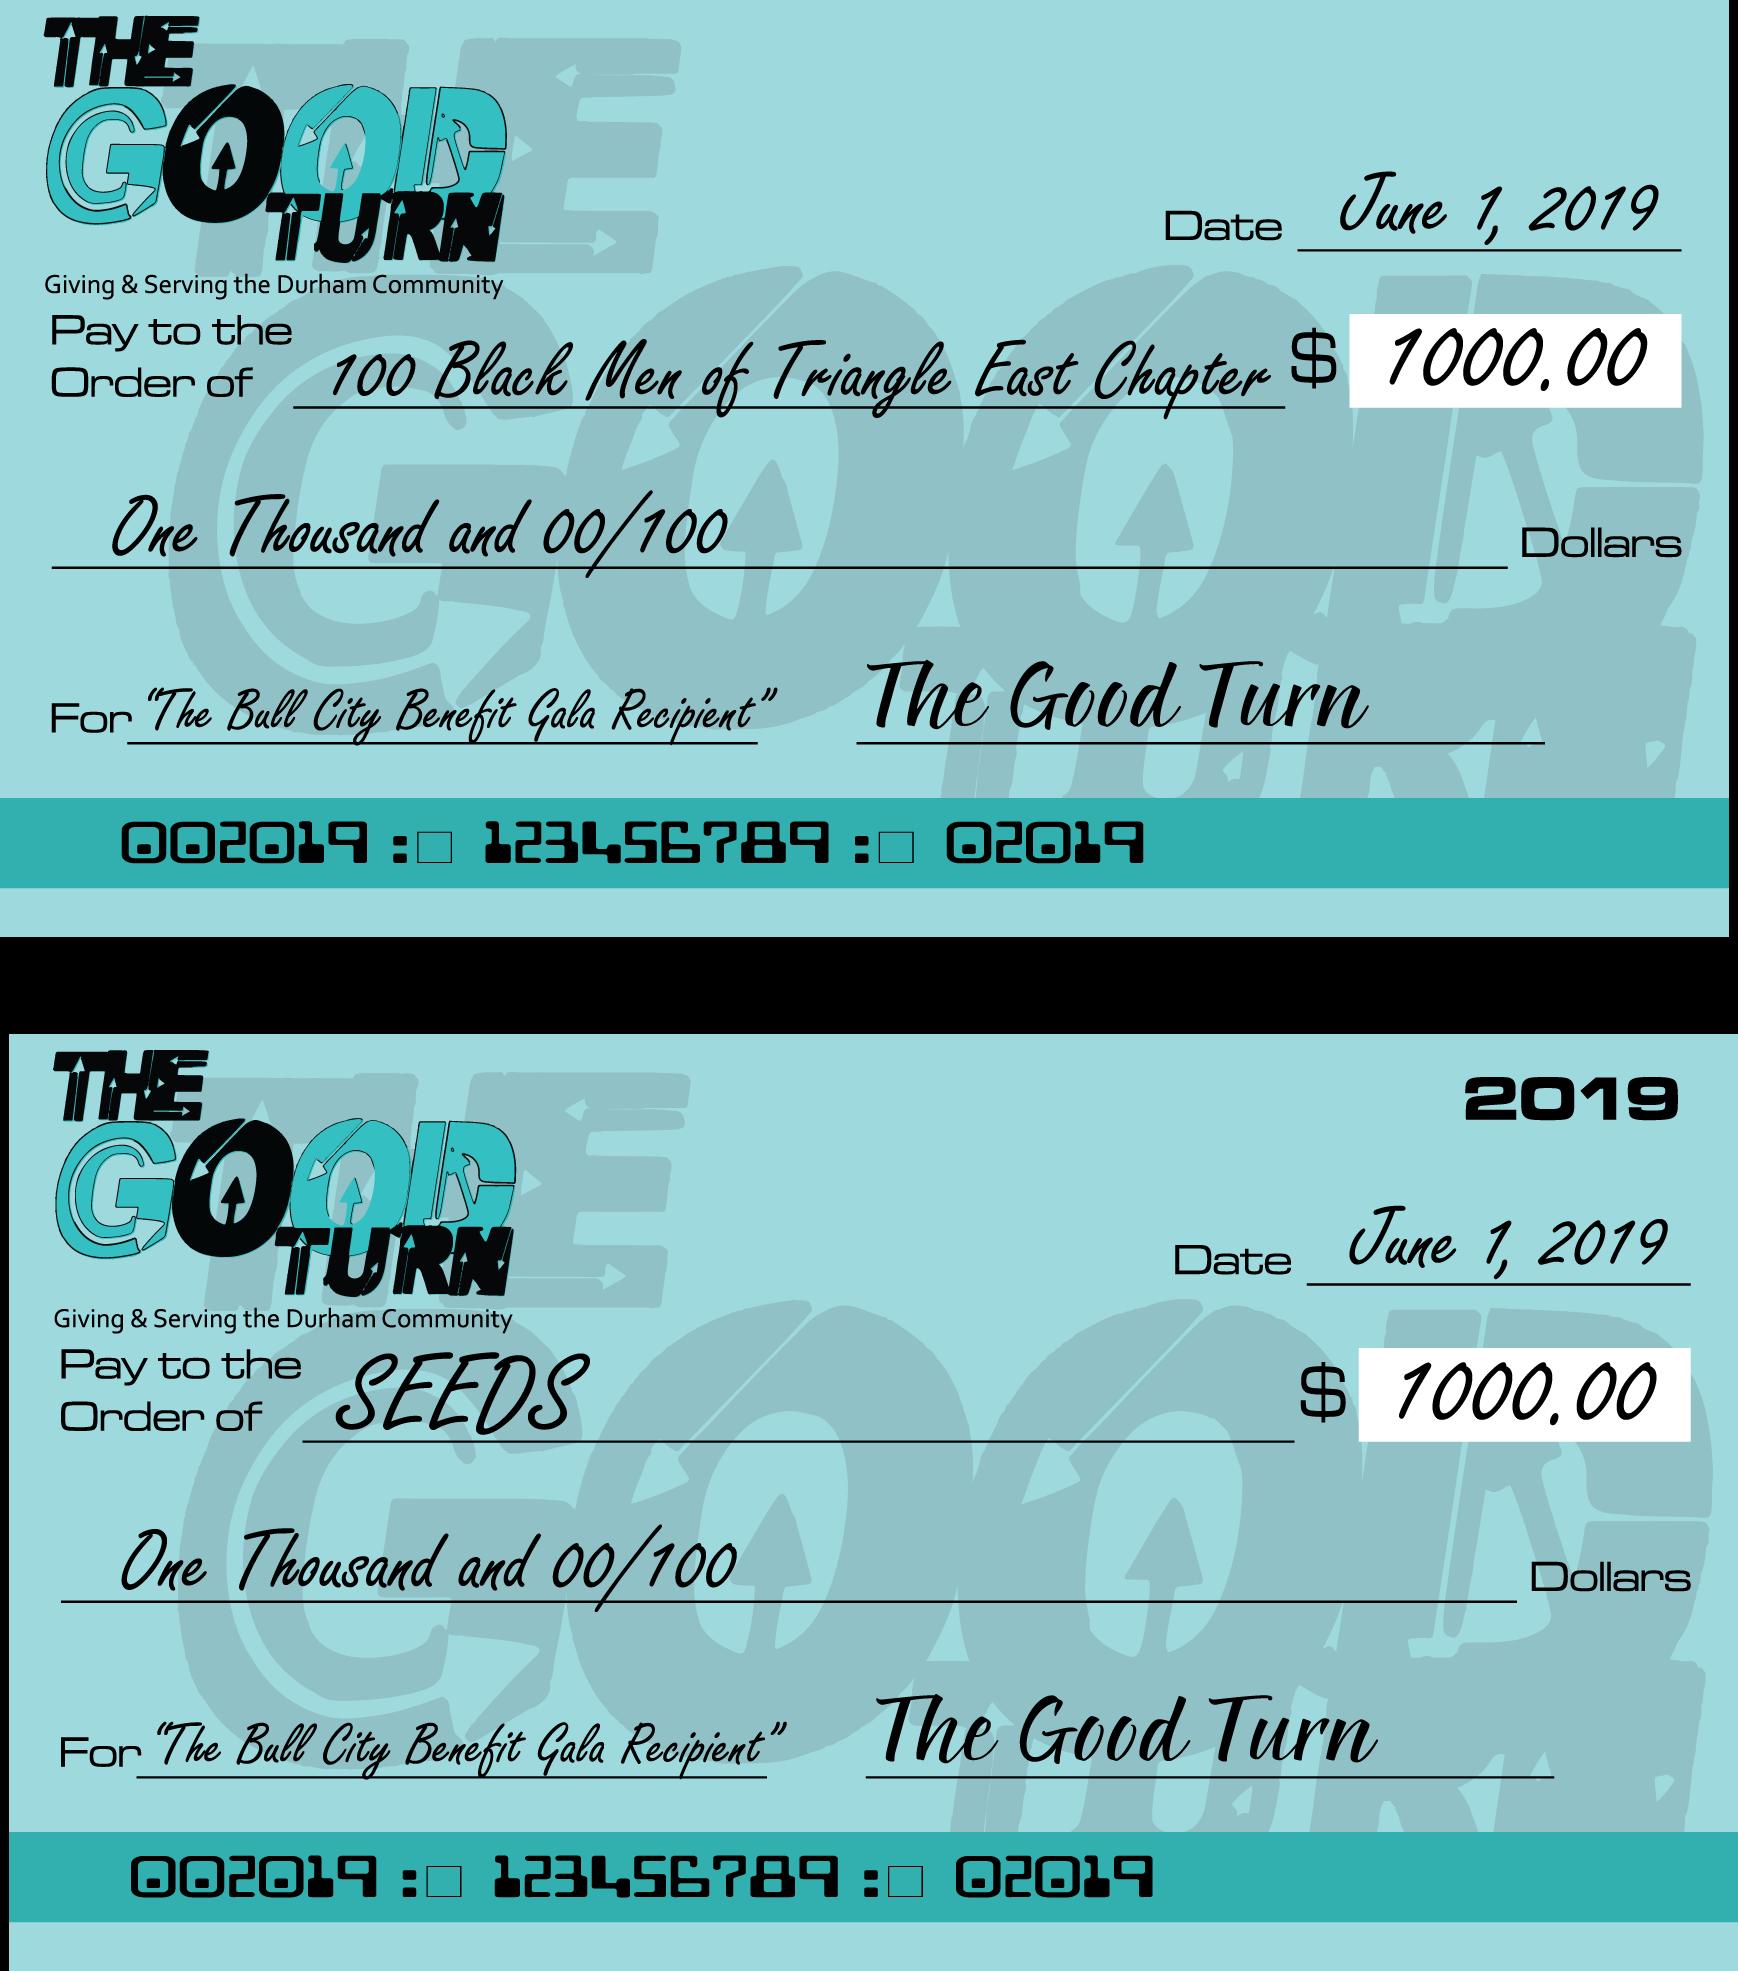 The Good Turn Checks